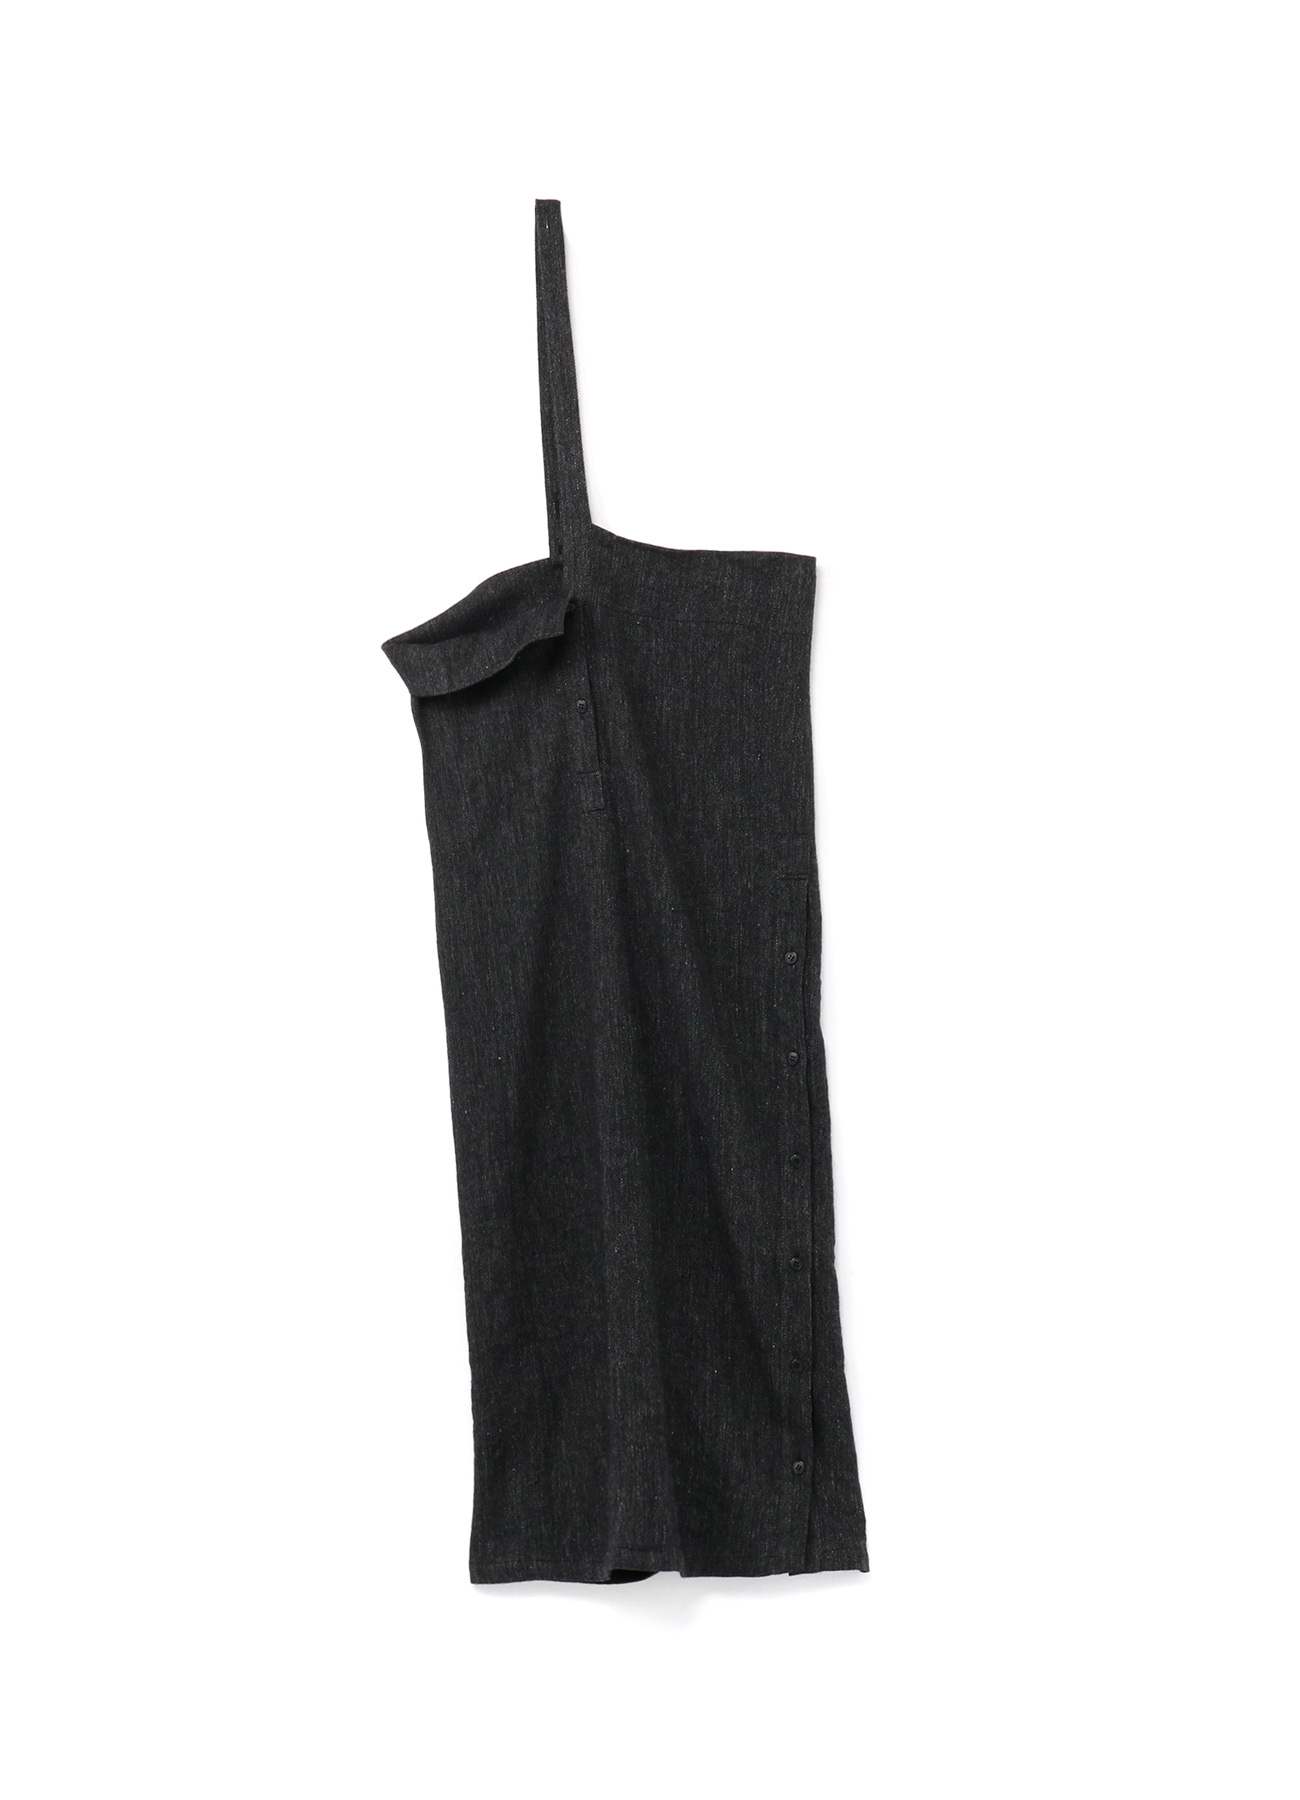 Li/W Herringbone Button Hanging Skirt